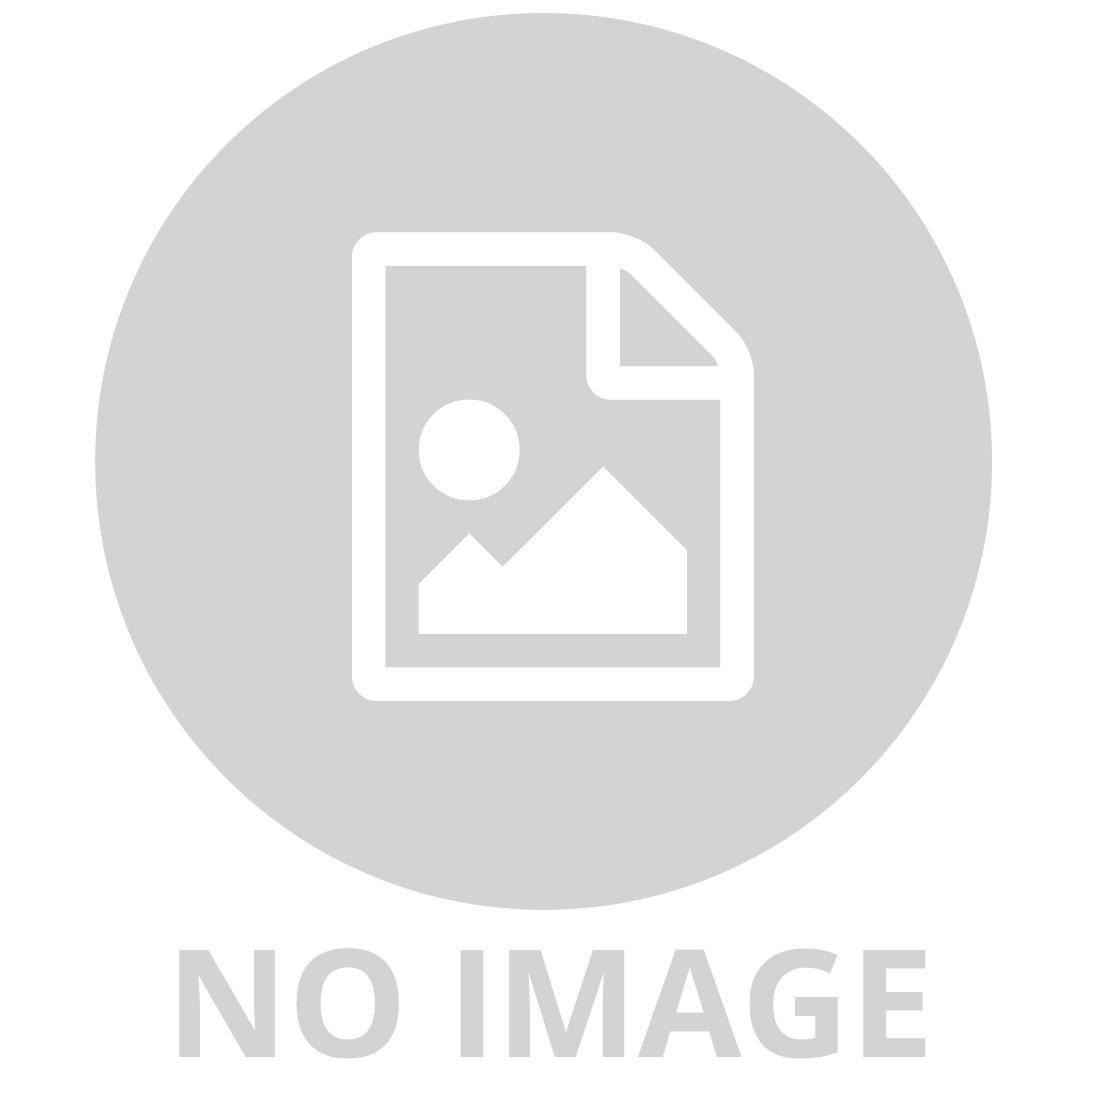 LEGO STAR WARS 75216 SNOKE'S THRONE ROOM